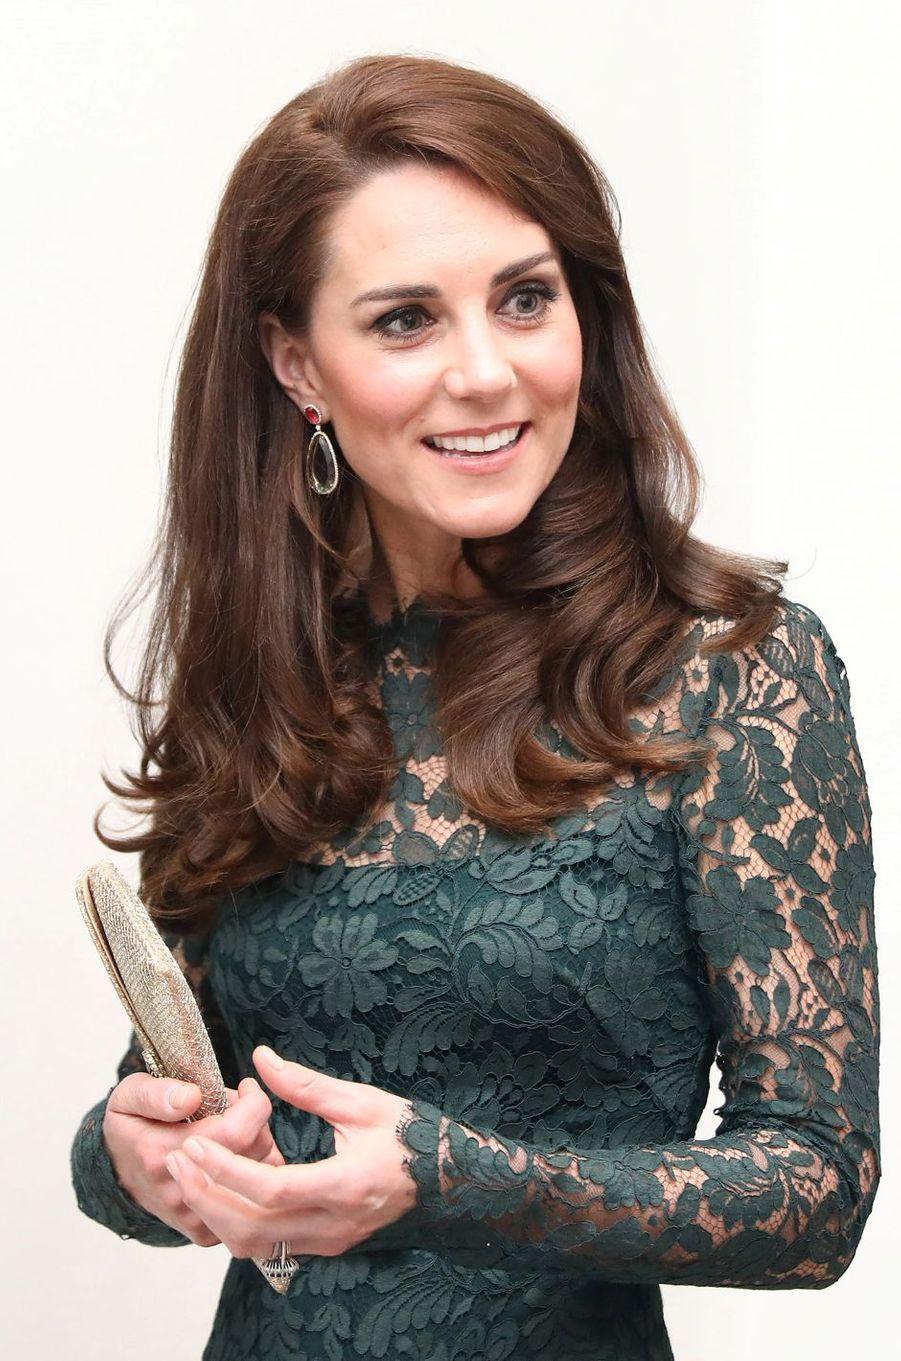 La duchesse Catherine de Cambridge le 28 mars 2017